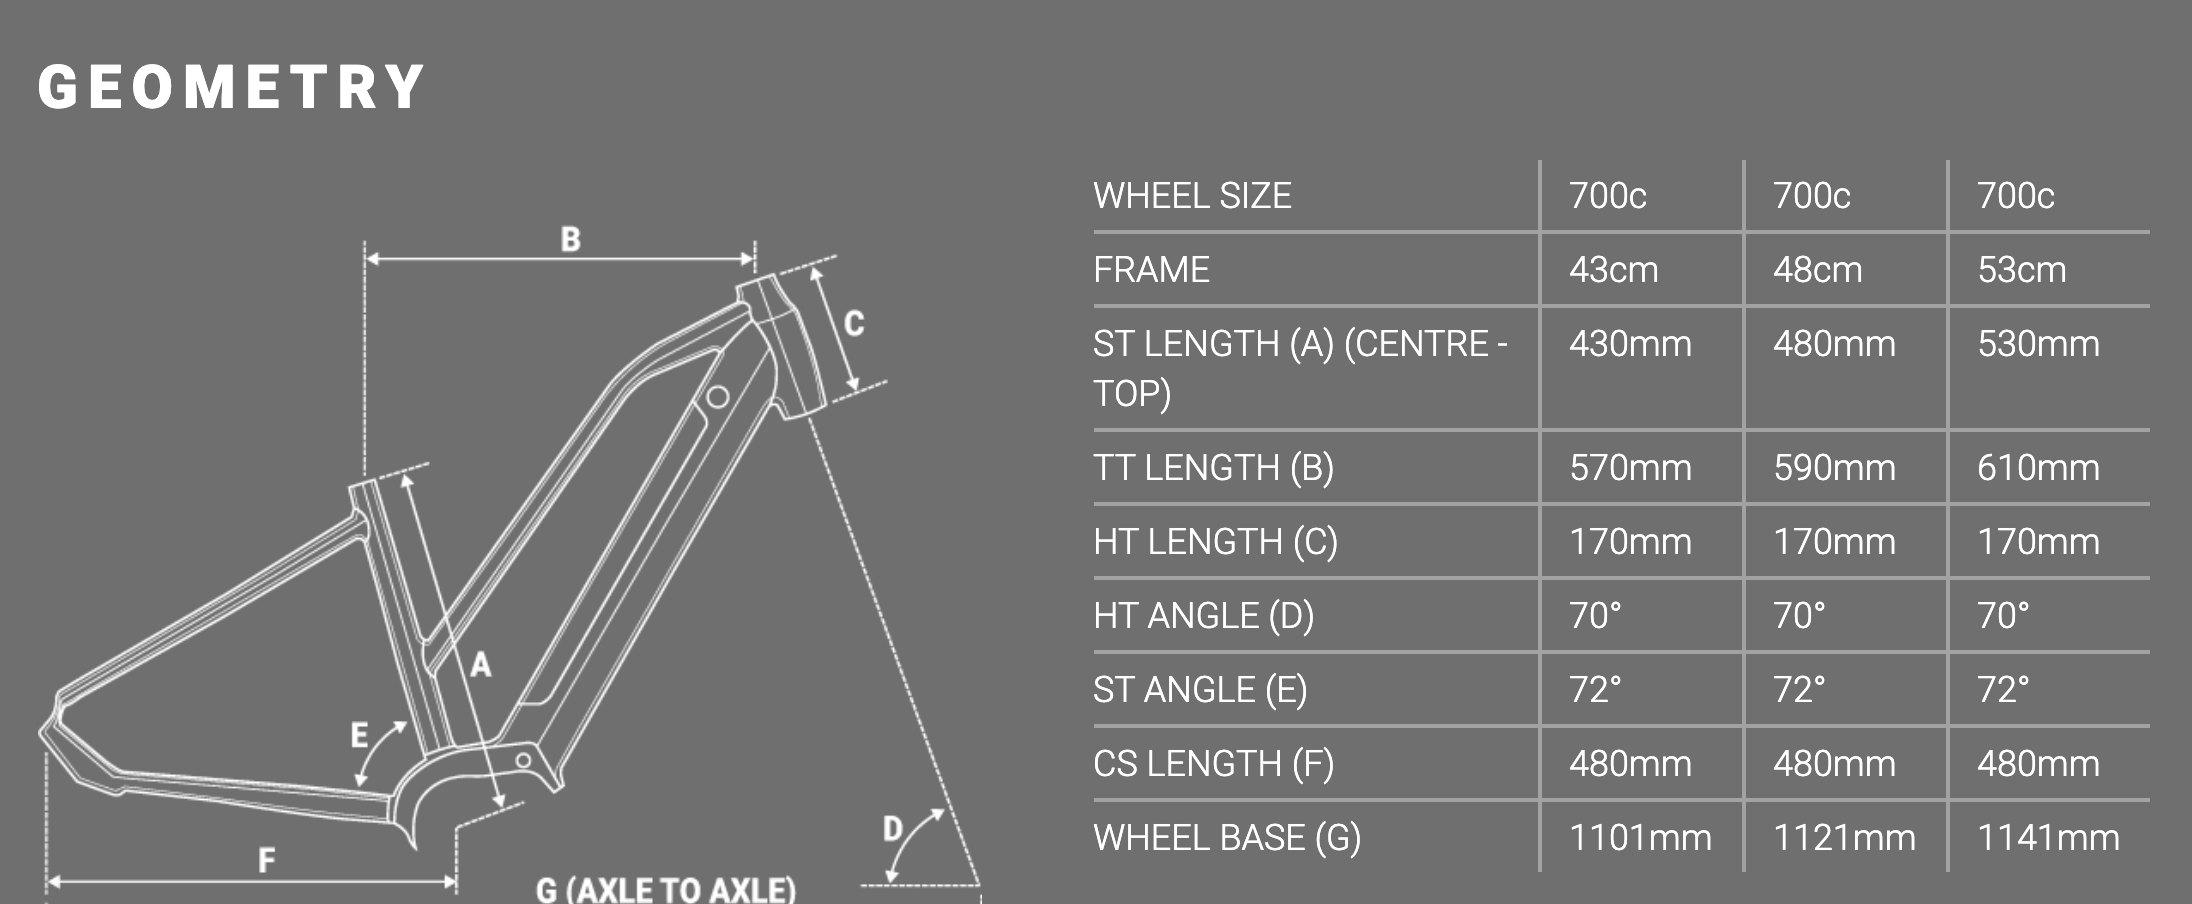 Forme Peak Trail ELS Geometry Chart